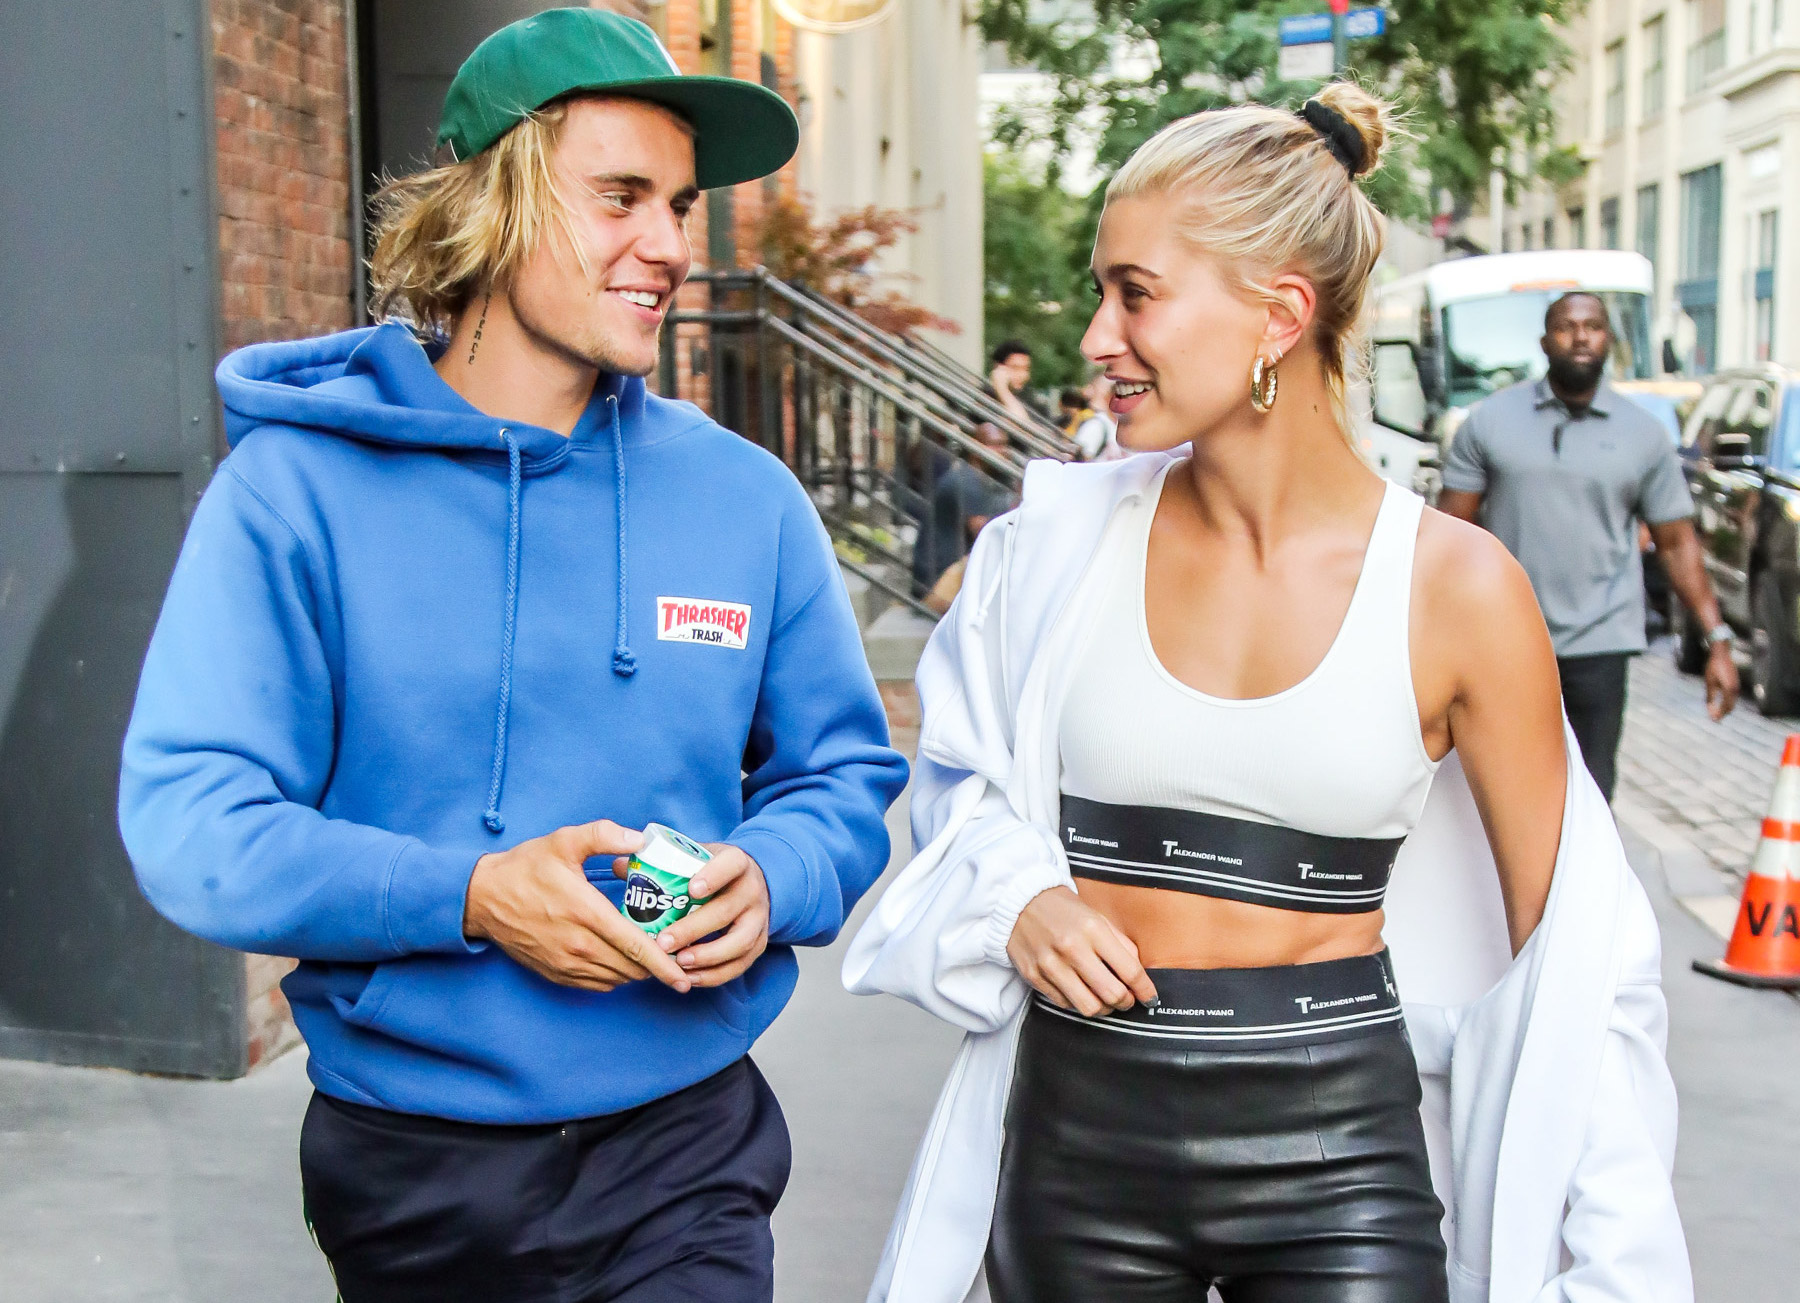 Couple Style: Justin Bieber & Hailey Baldwin's Best Looks